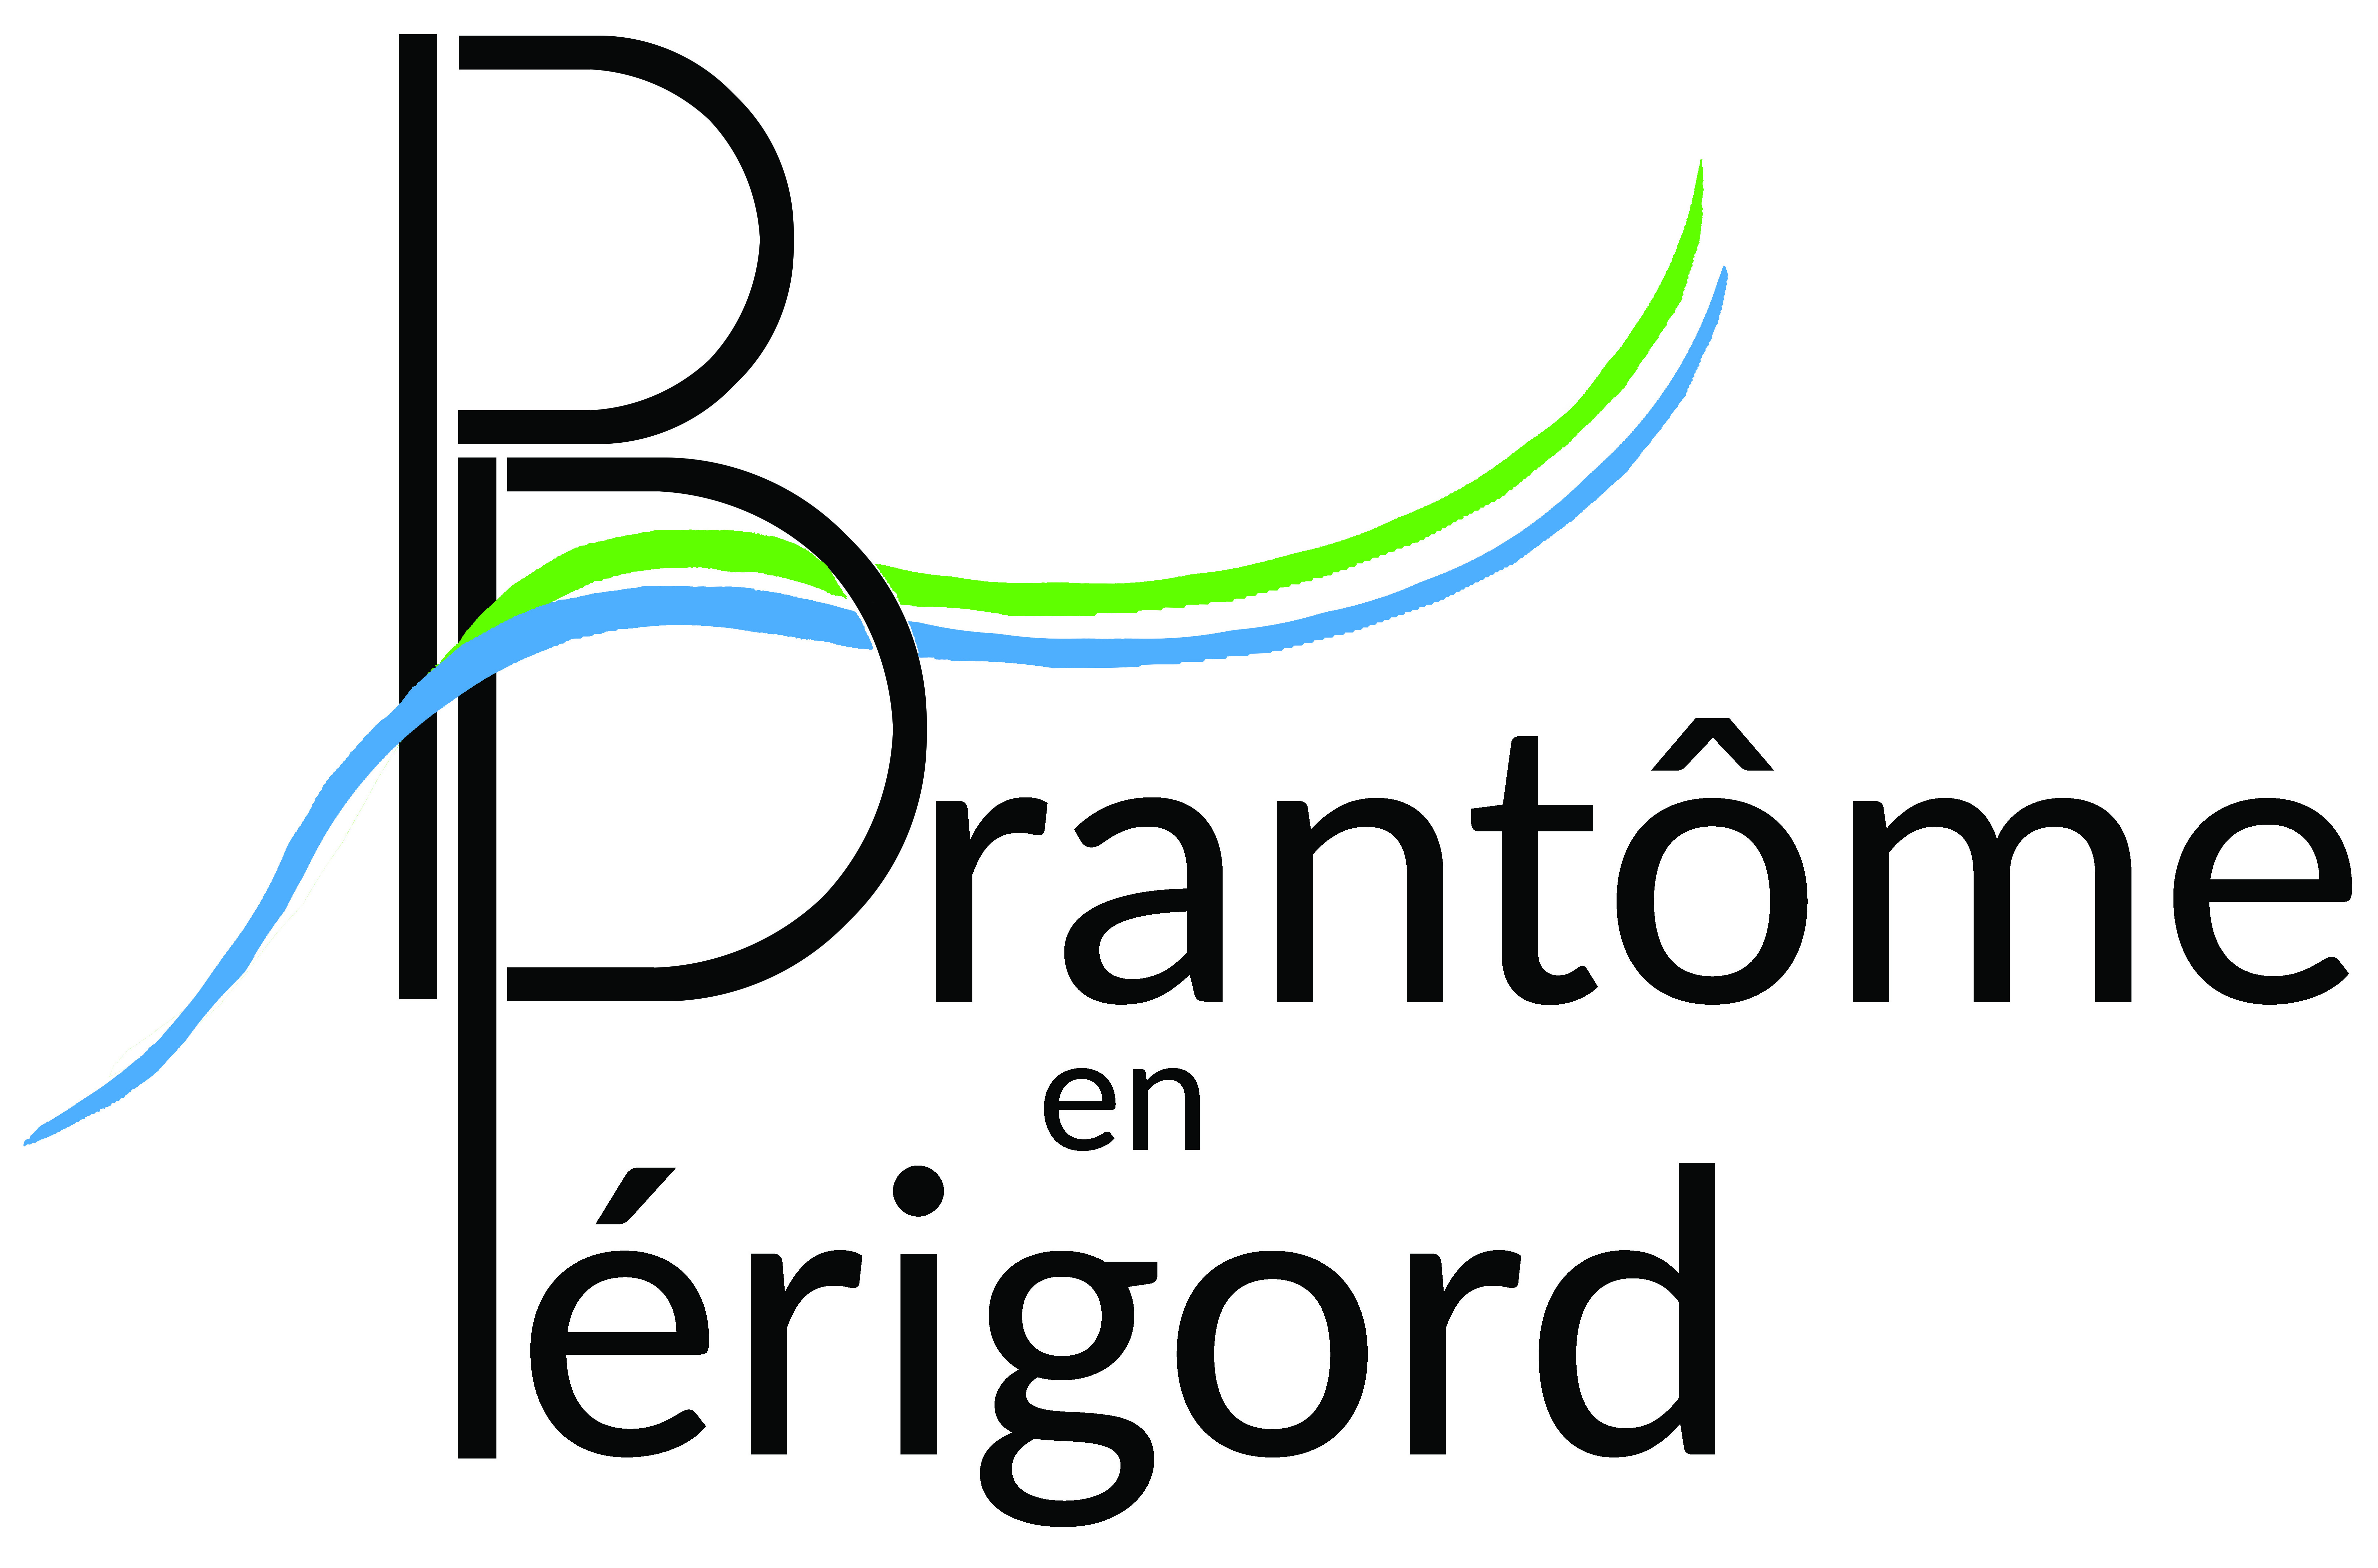 Commune de Brantôme-en-Périgord